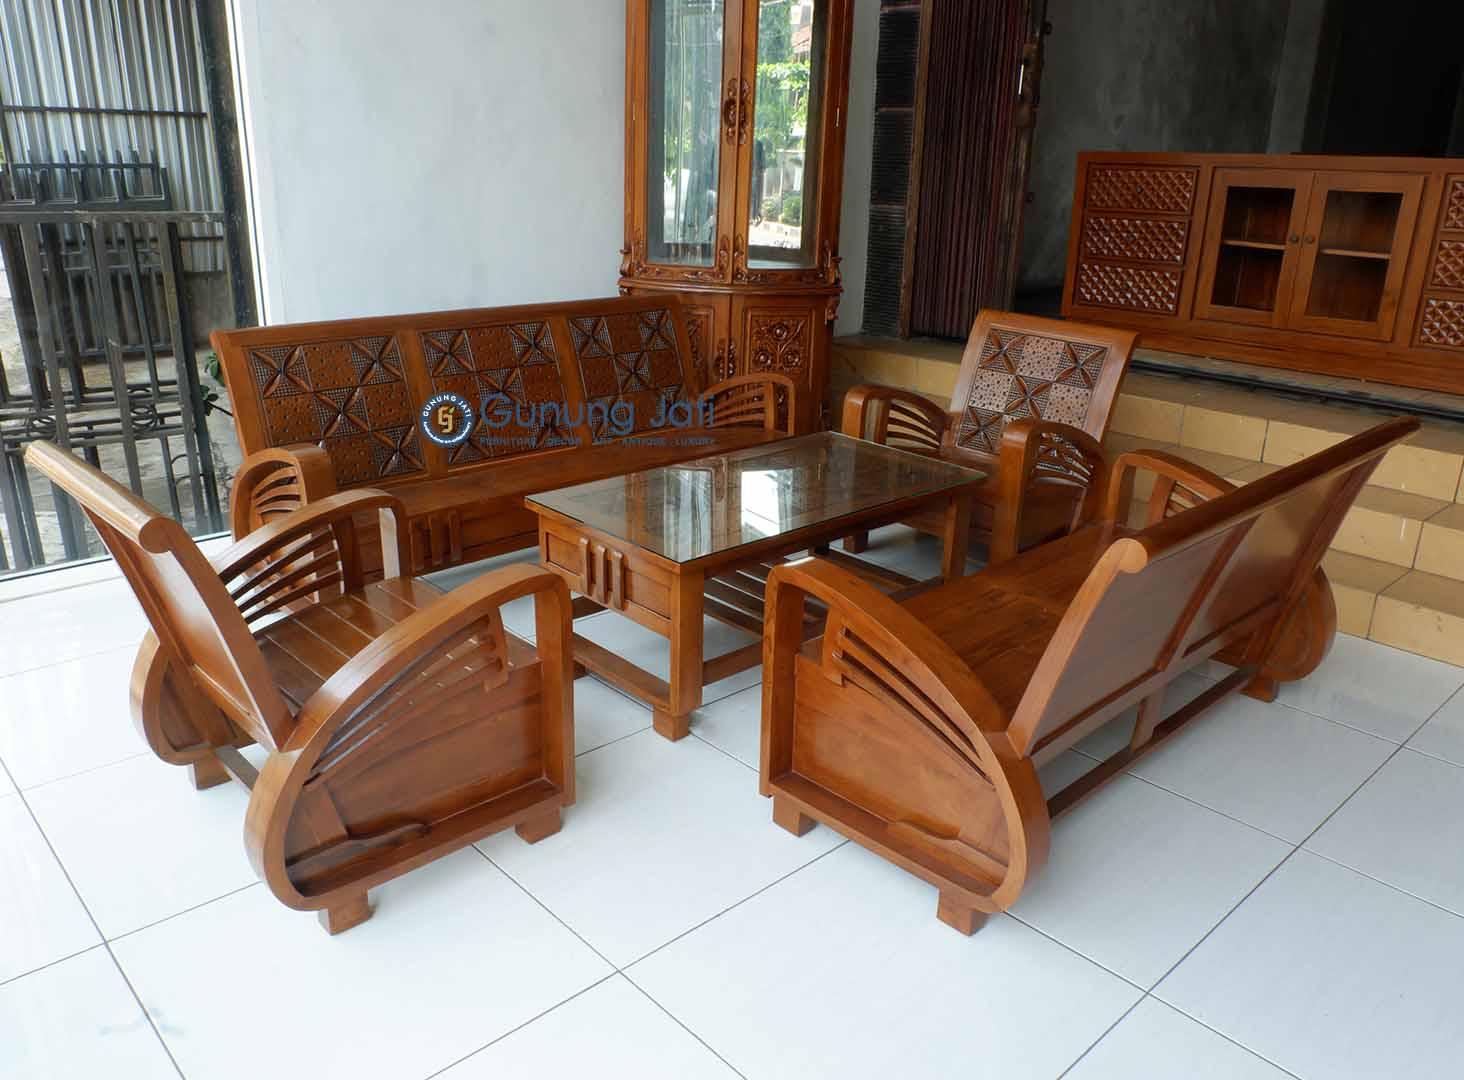 Modern Antique Minimalized - Modern Antique Minimalized - Gunung Jati Furniture